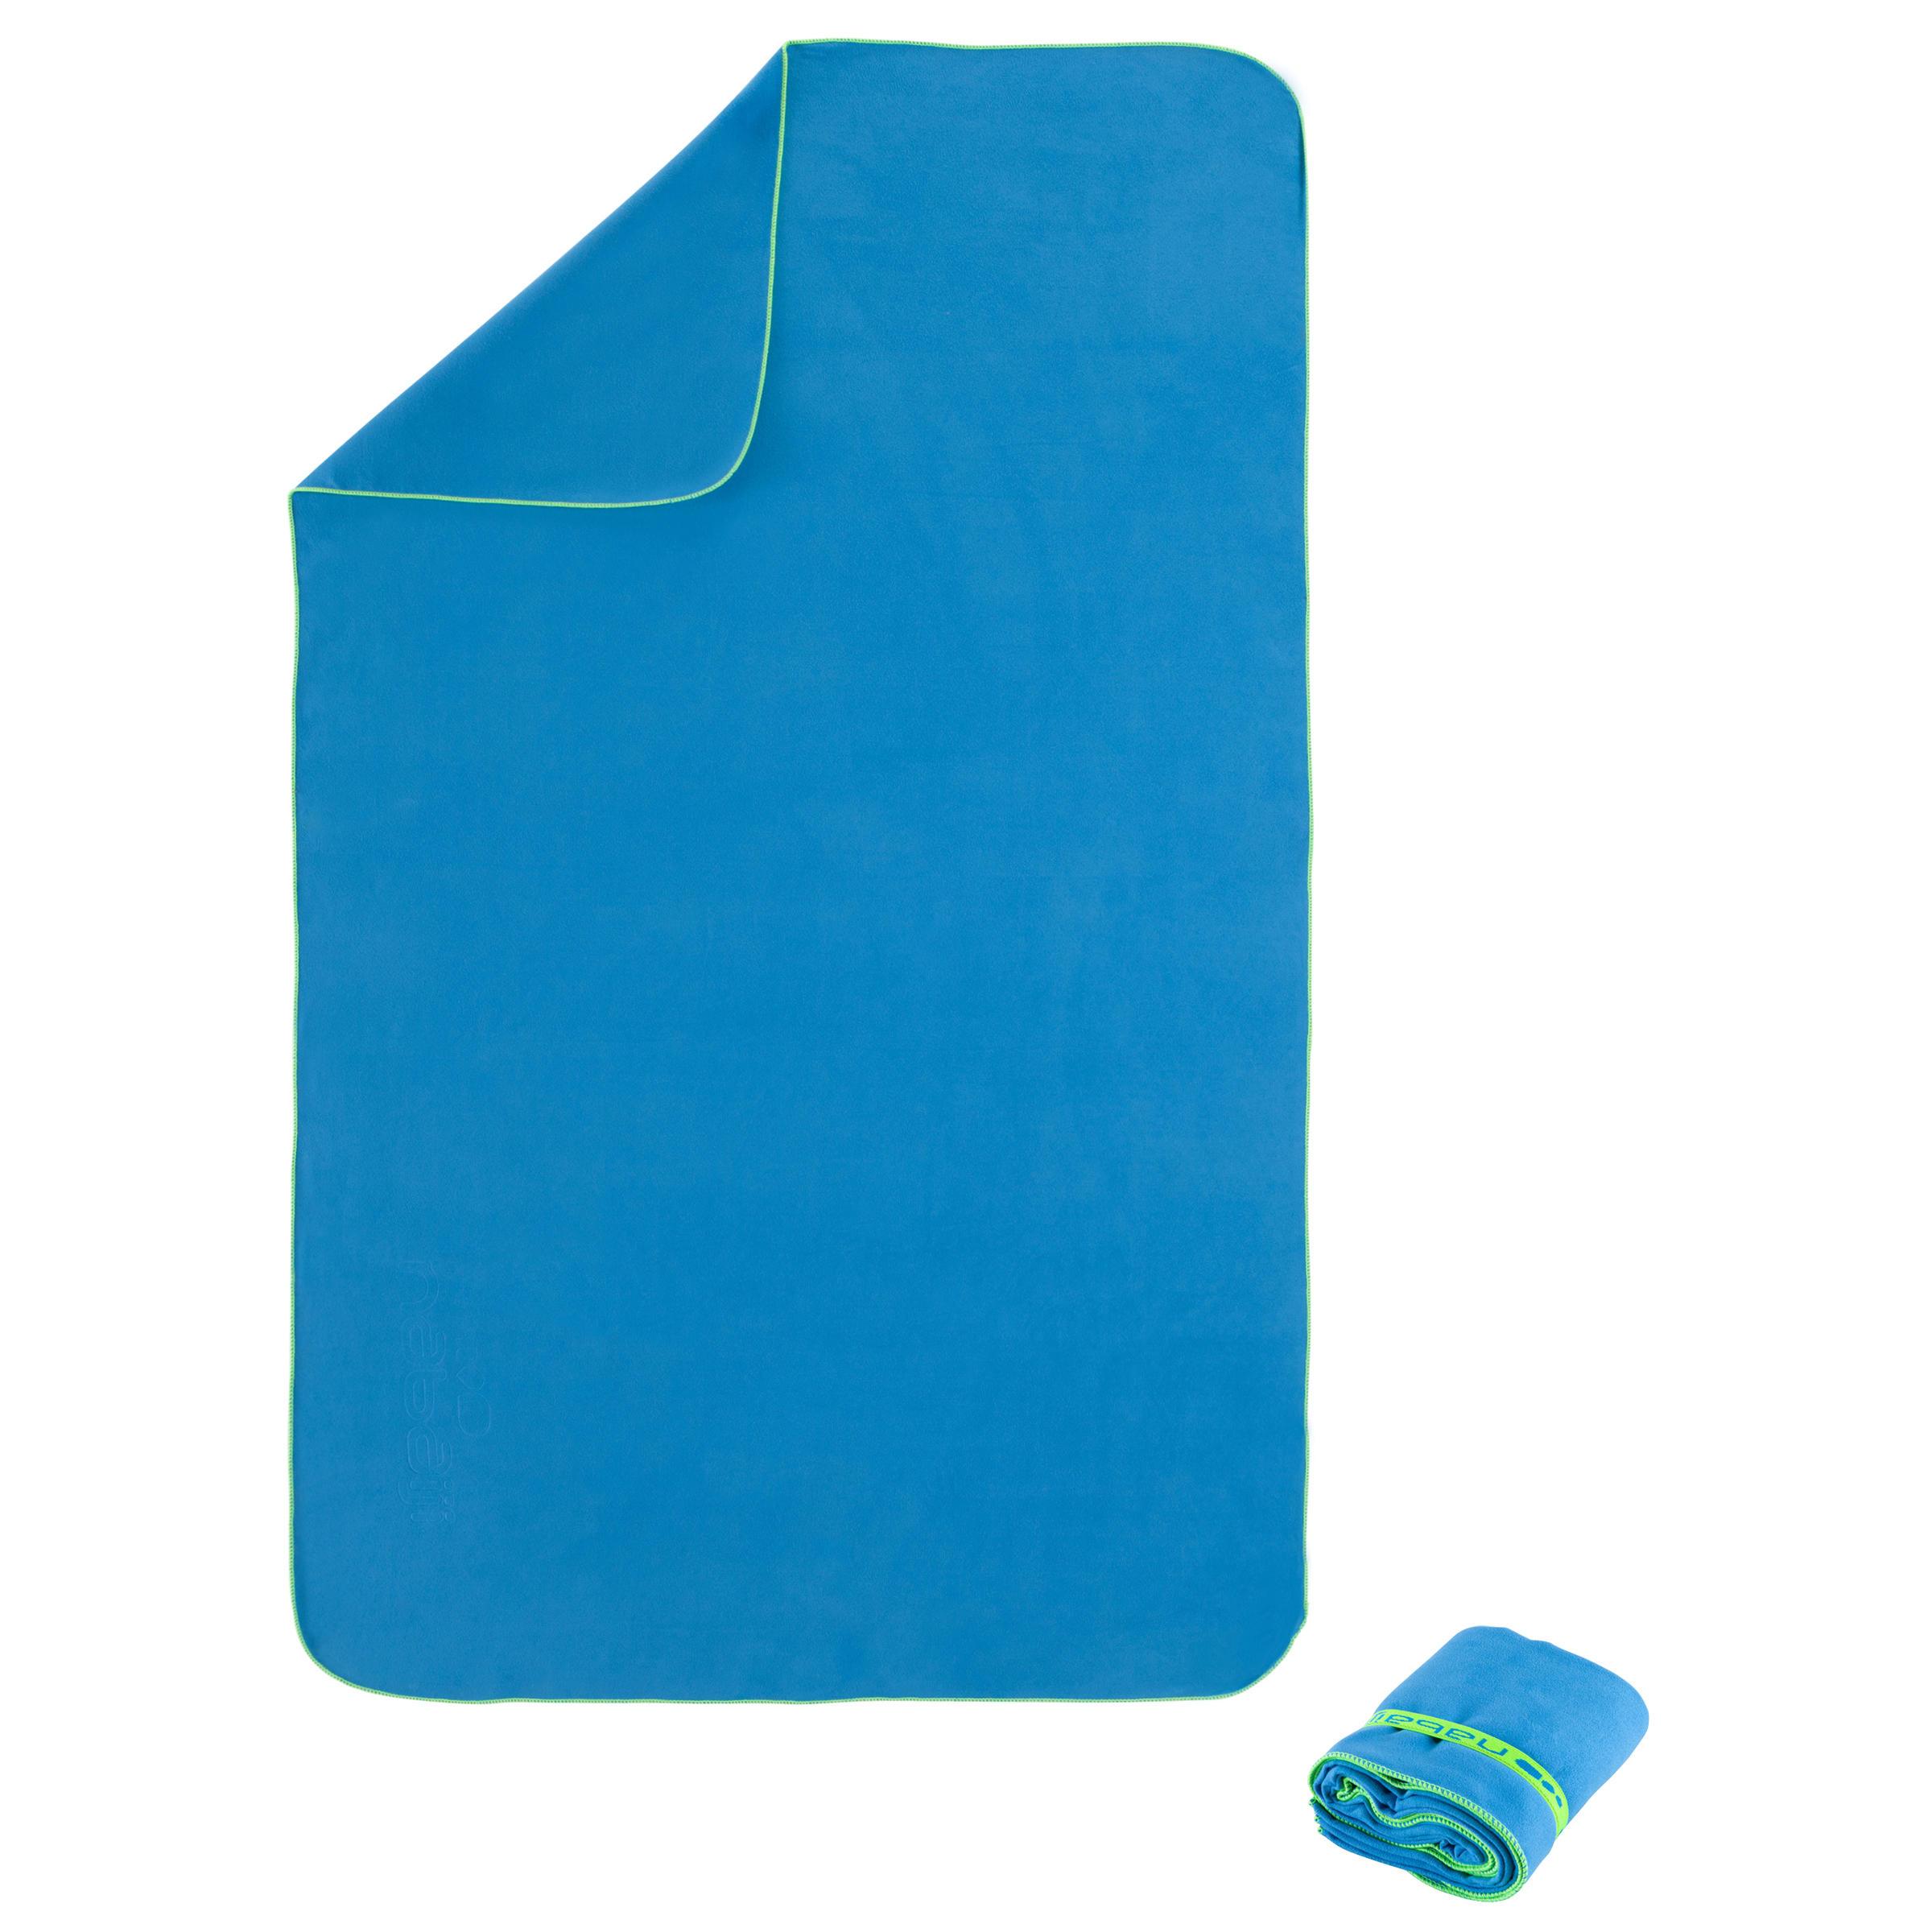 Ultra compact microfibre towel size L 80 x 130 cm - Biru Laut